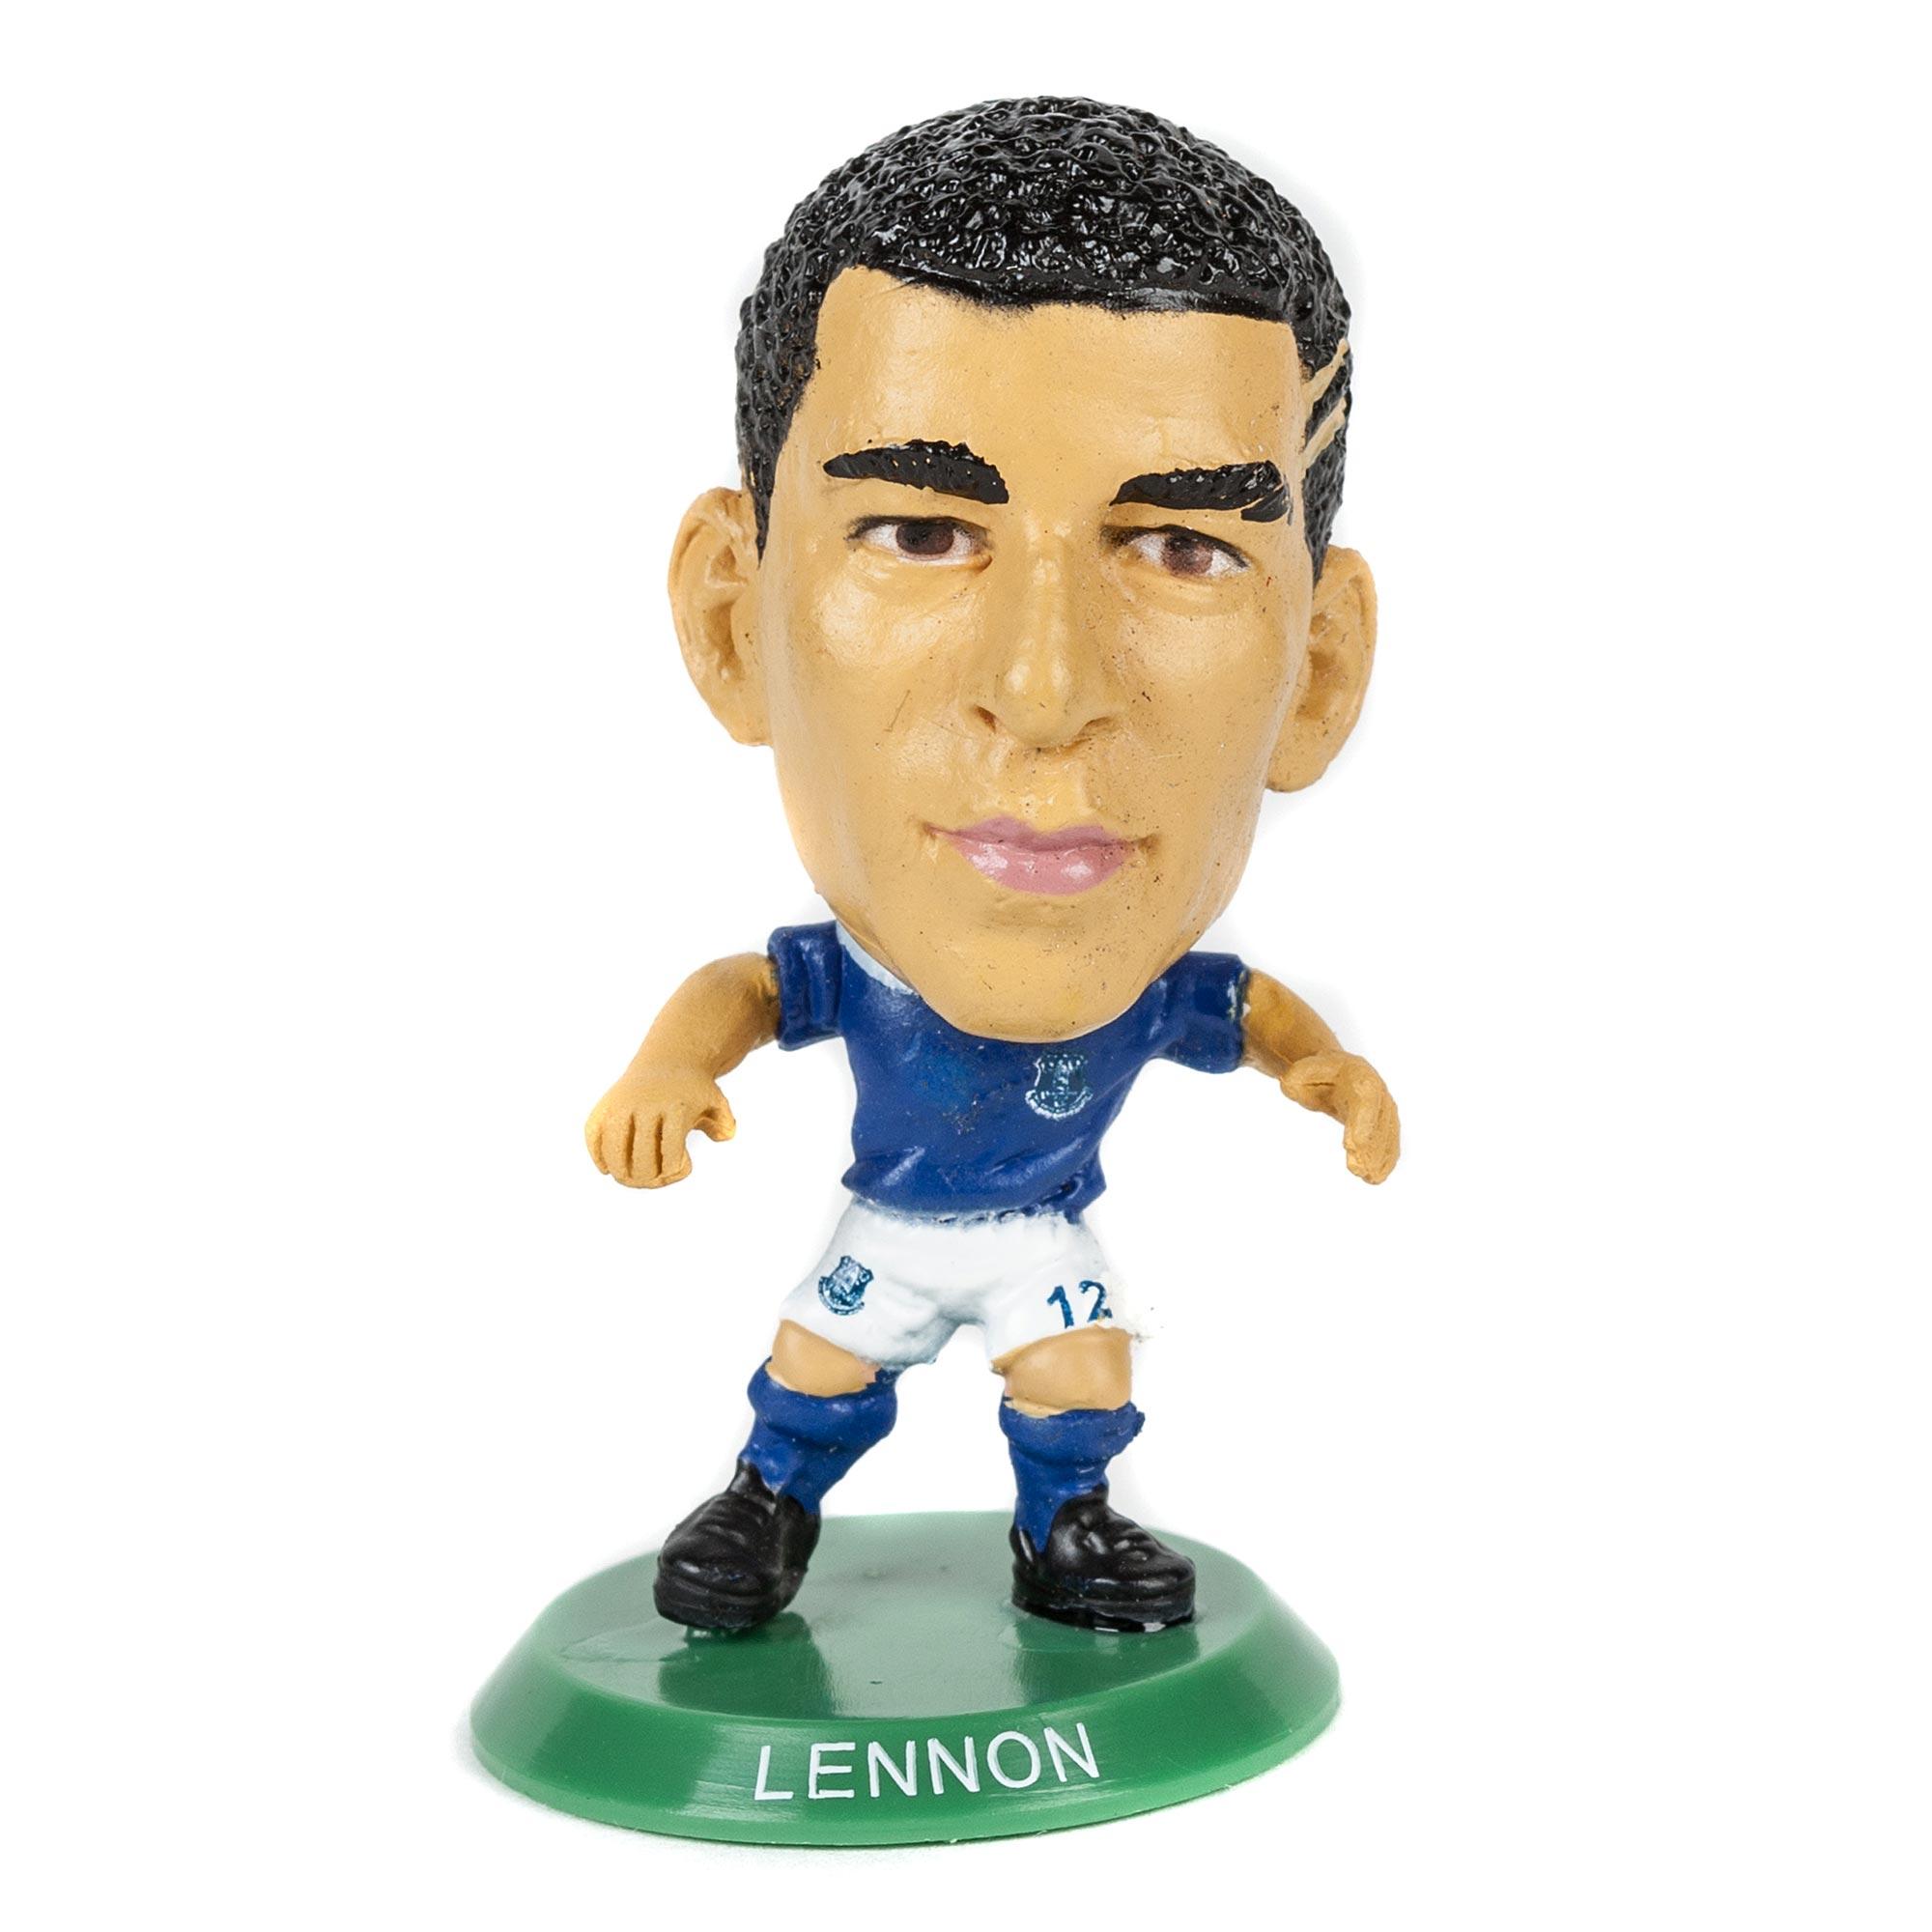 Everton Lennon SoccerStarz